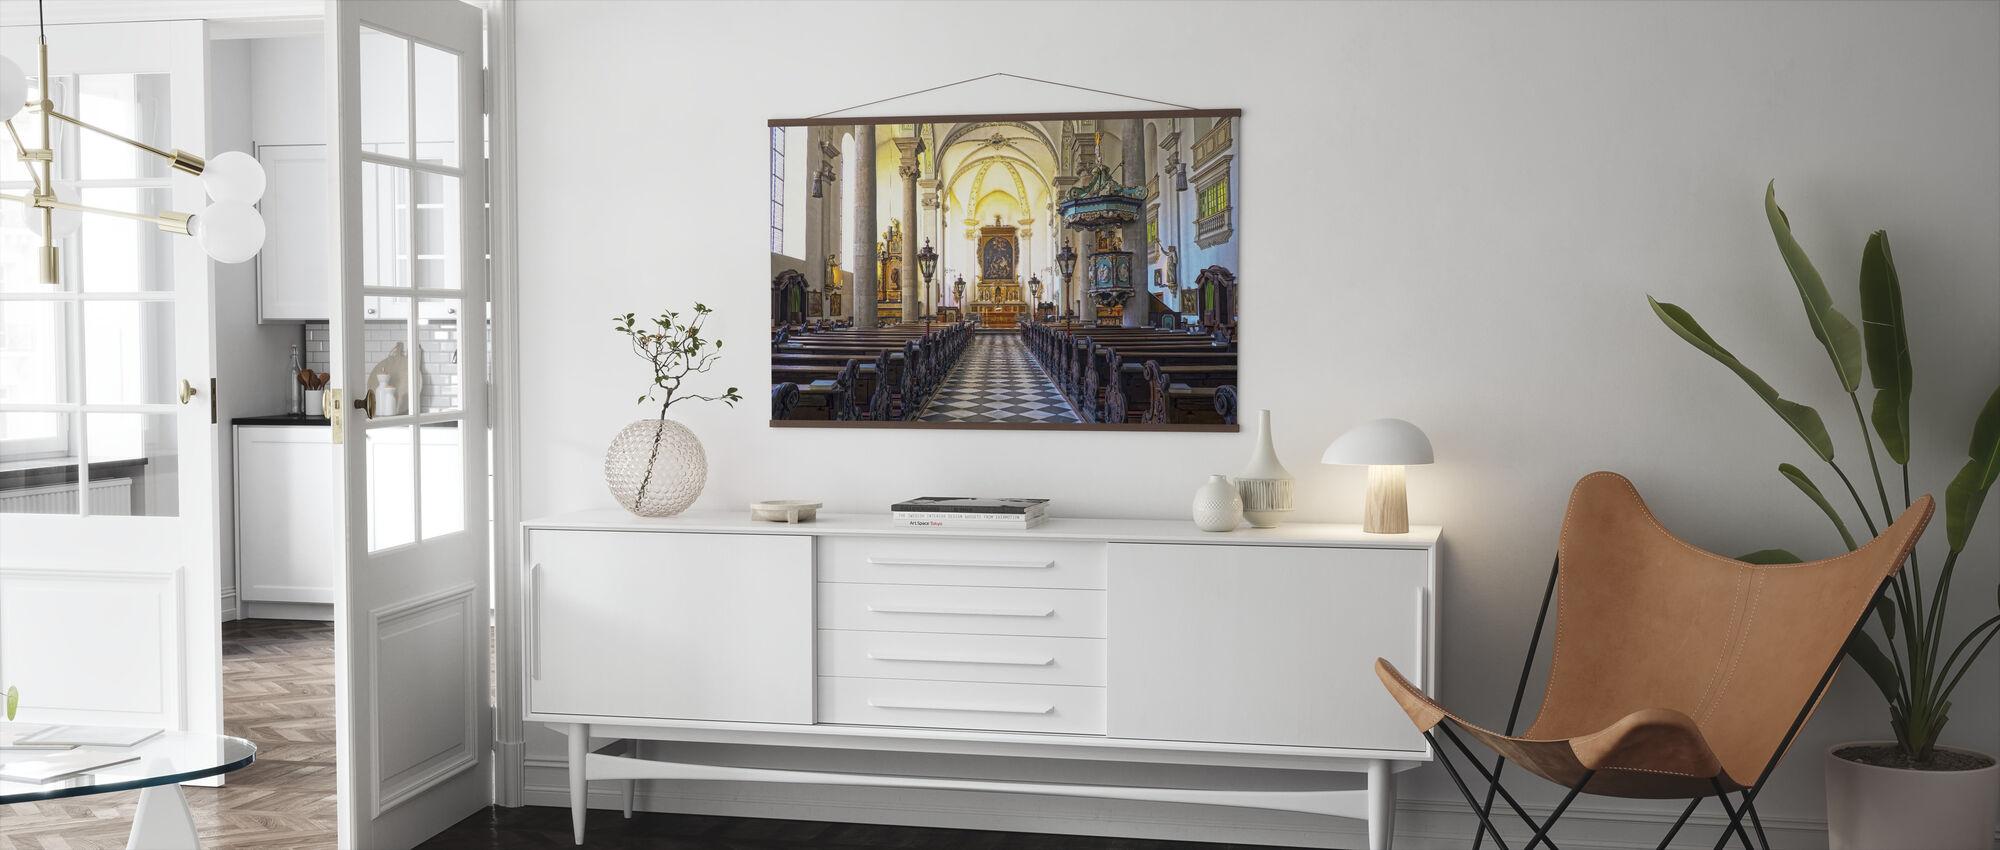 Church Pews - Poster - Living Room